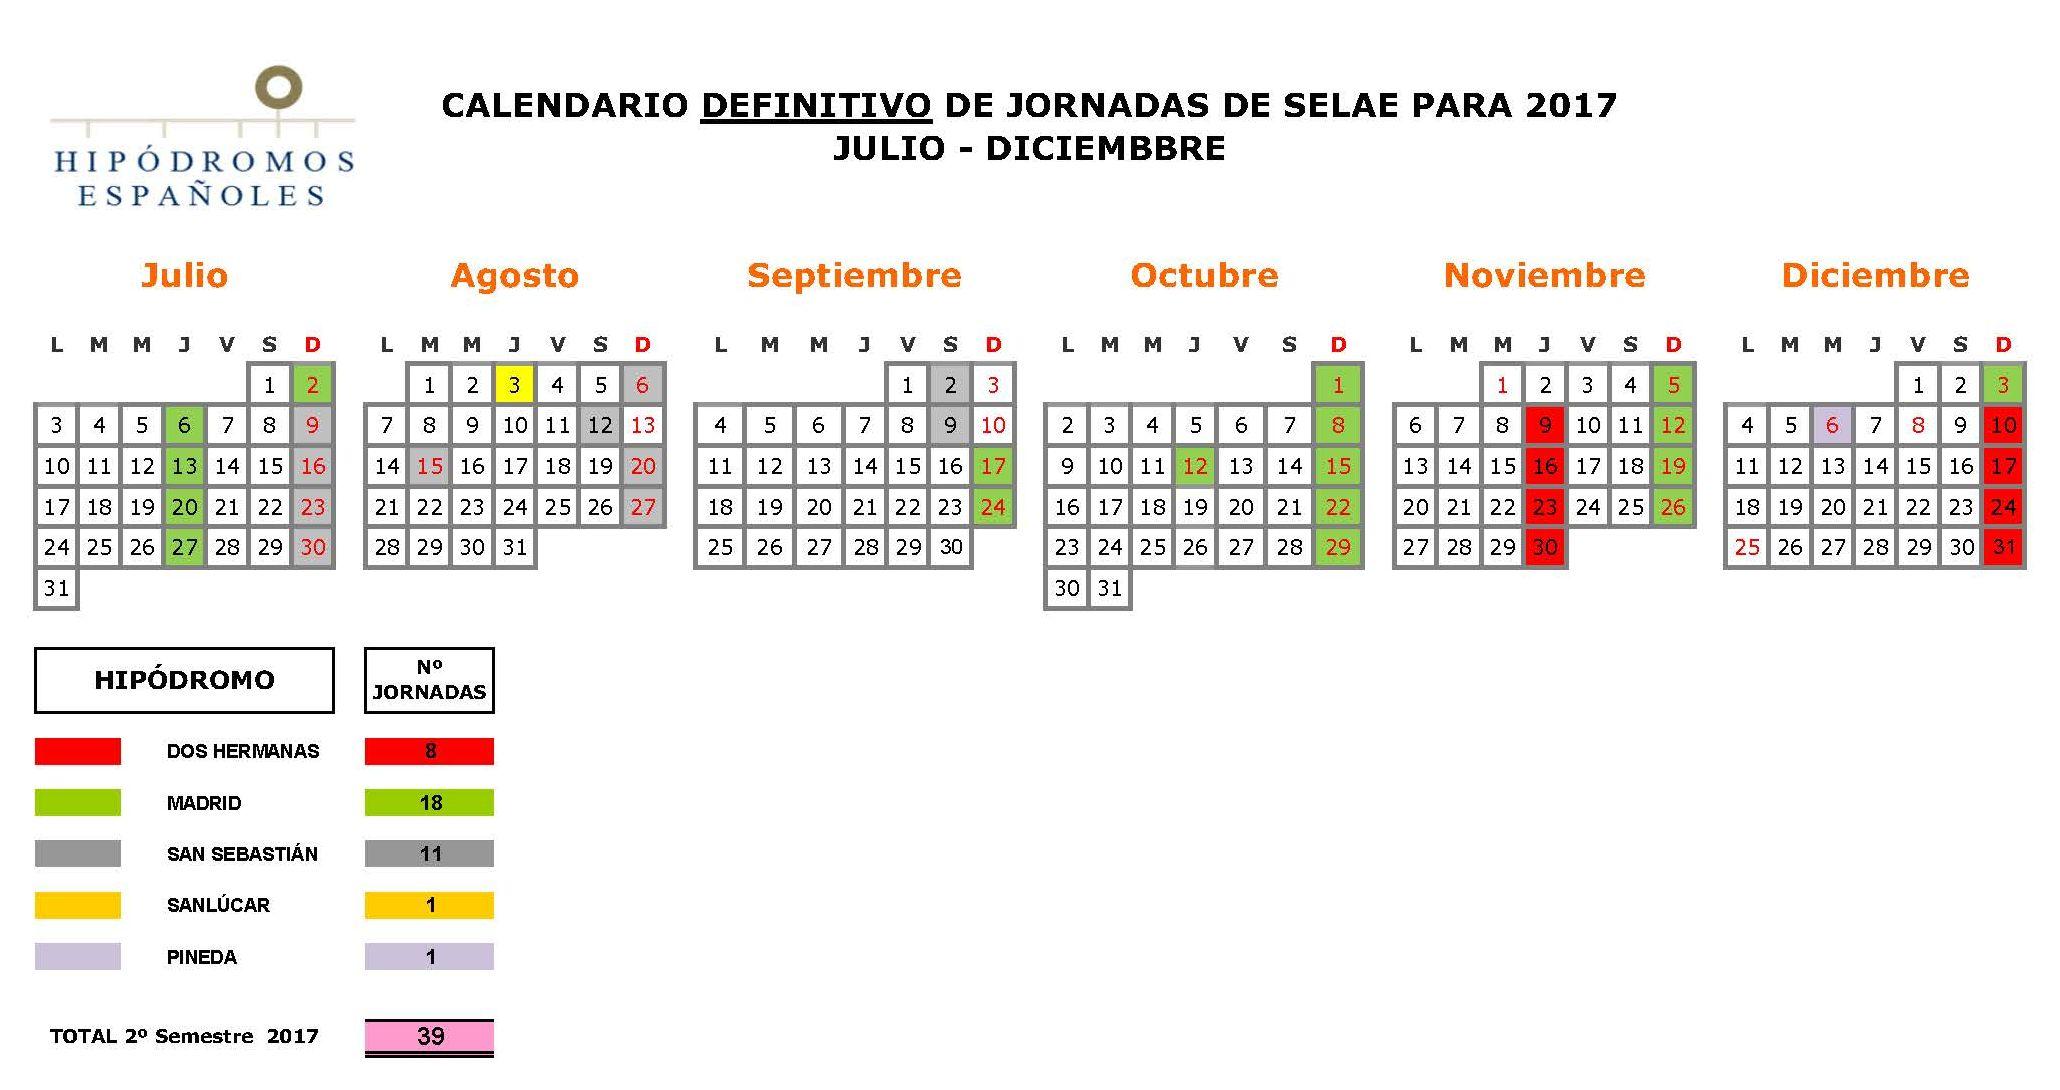 Asociación Española de Propietarios de Caballos de Carreras (AEPCC)